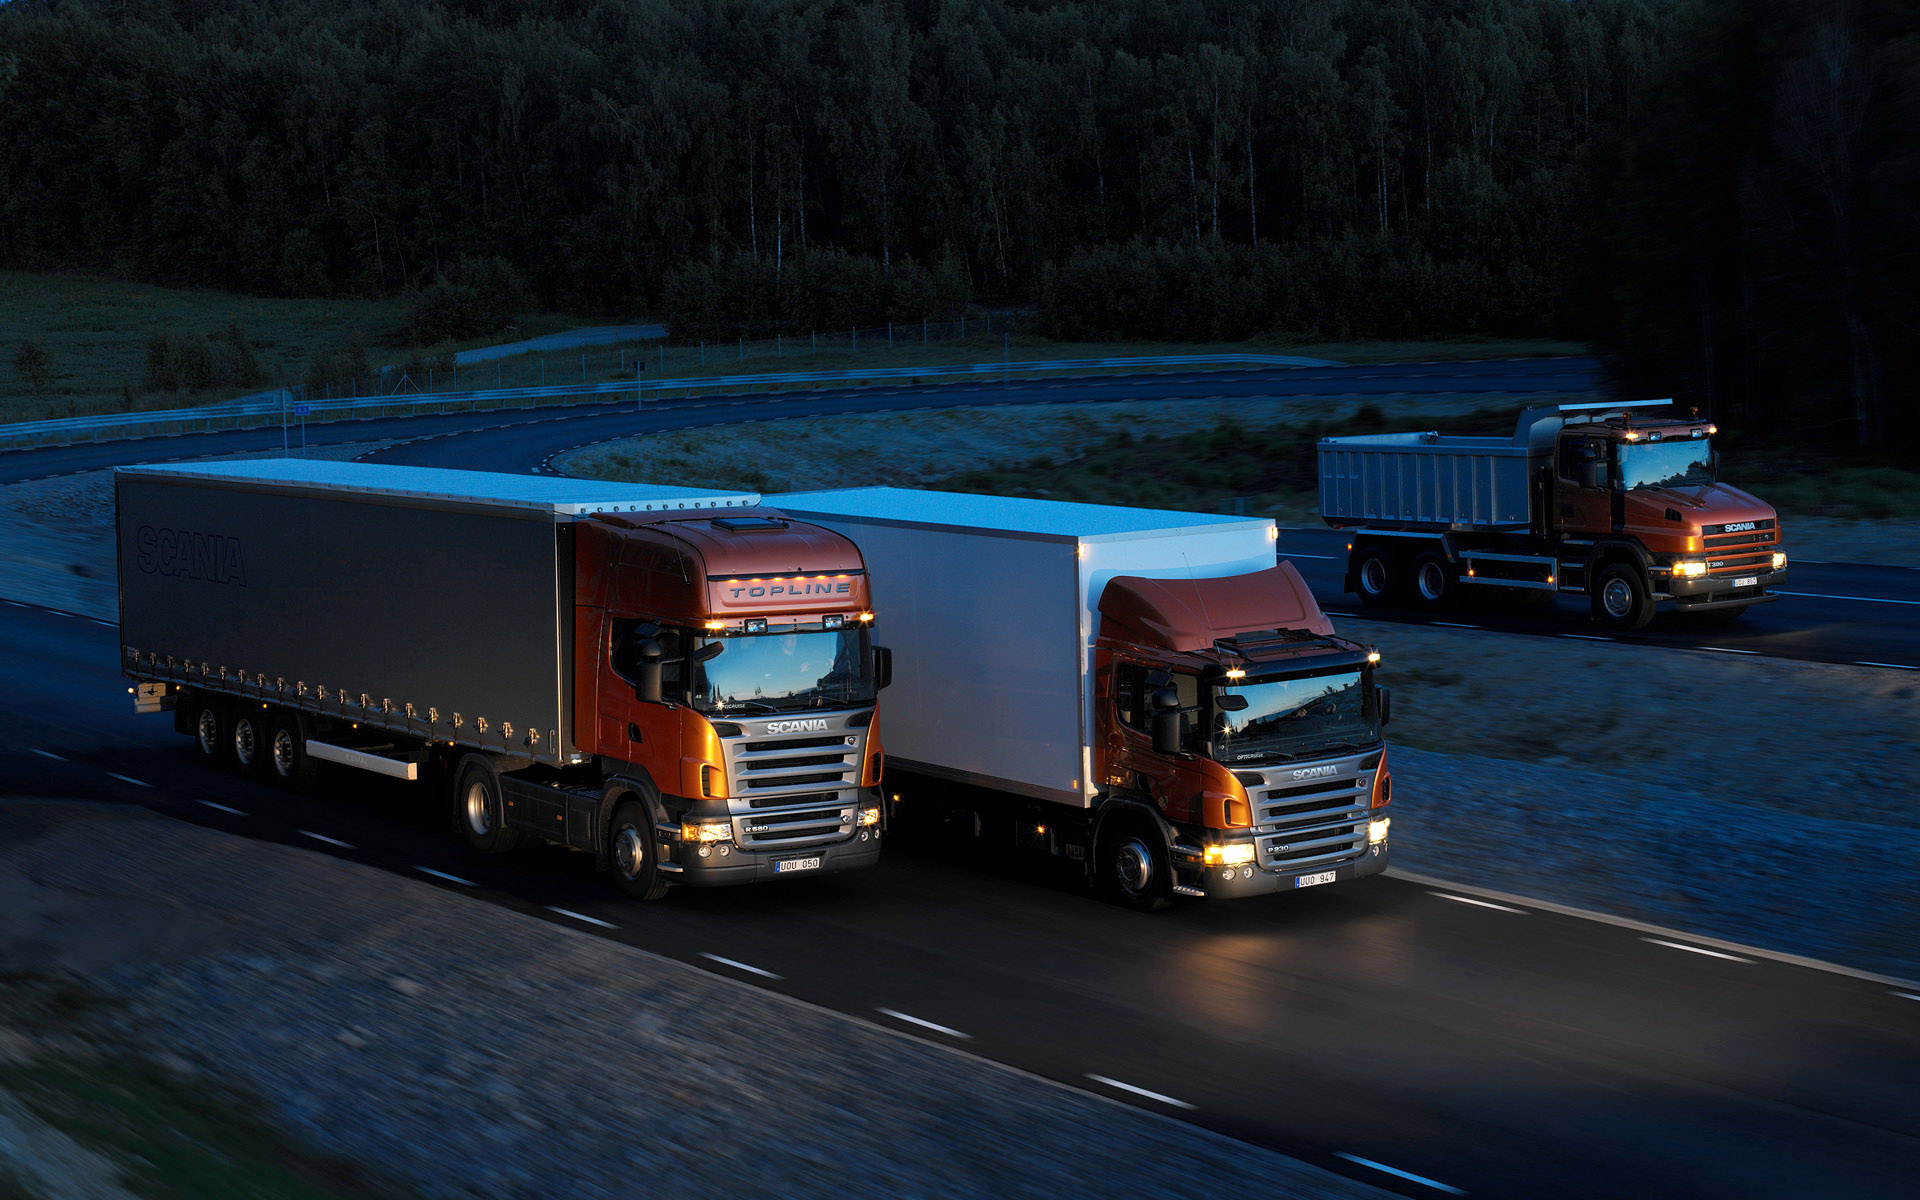 truck-wallpaper_1920x1200_83594